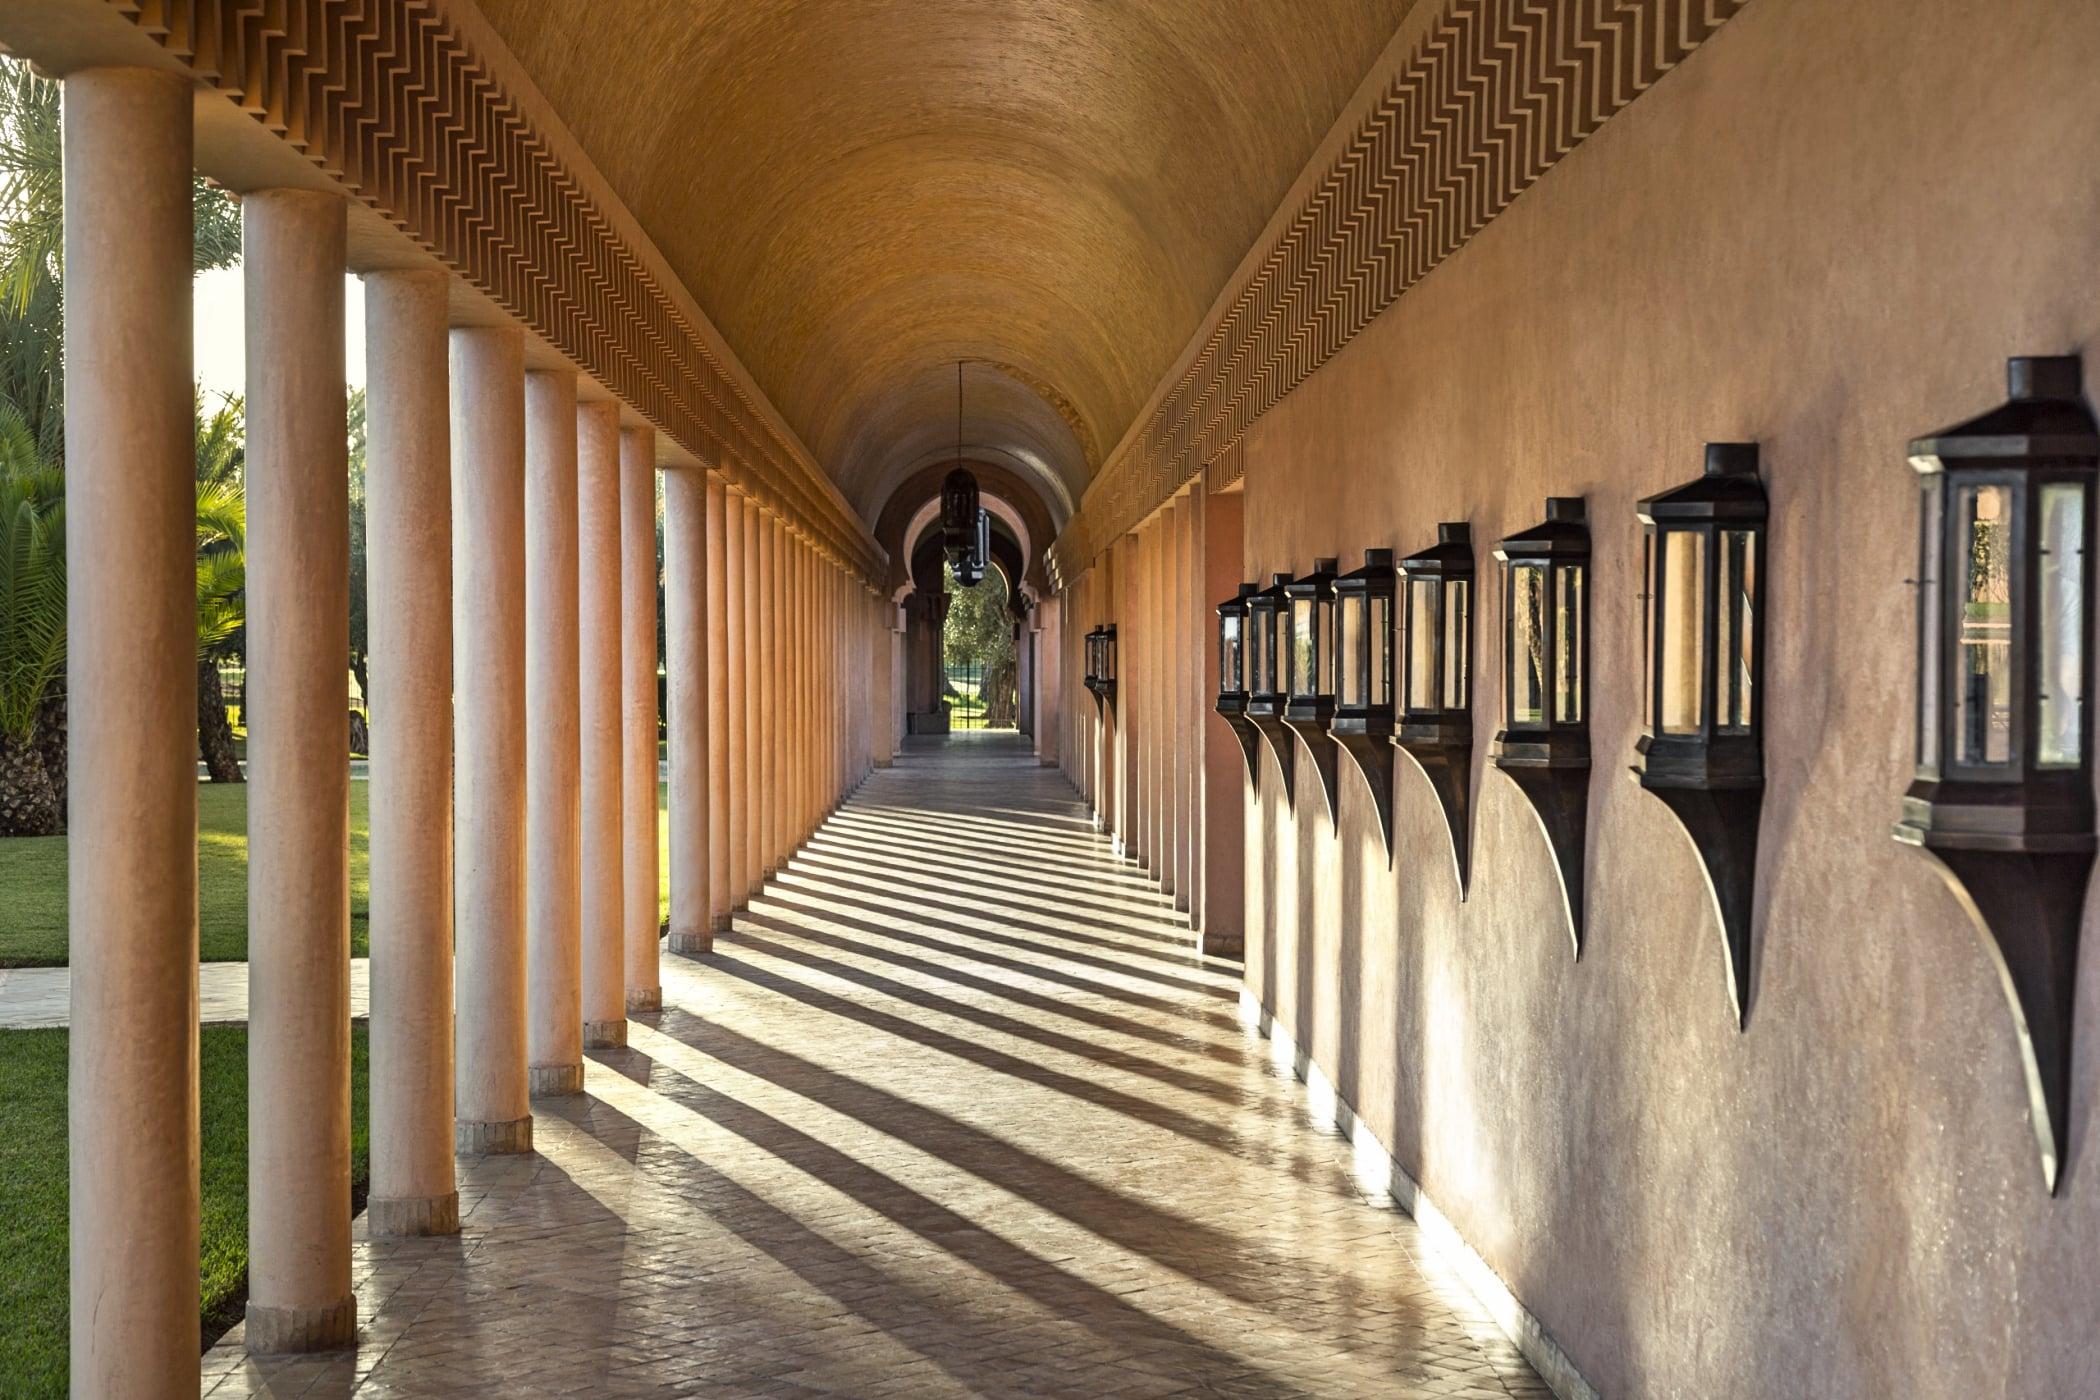 Aman_Amanjena_Morocco_main_gallery_fivestardestination_five_star_destination_45